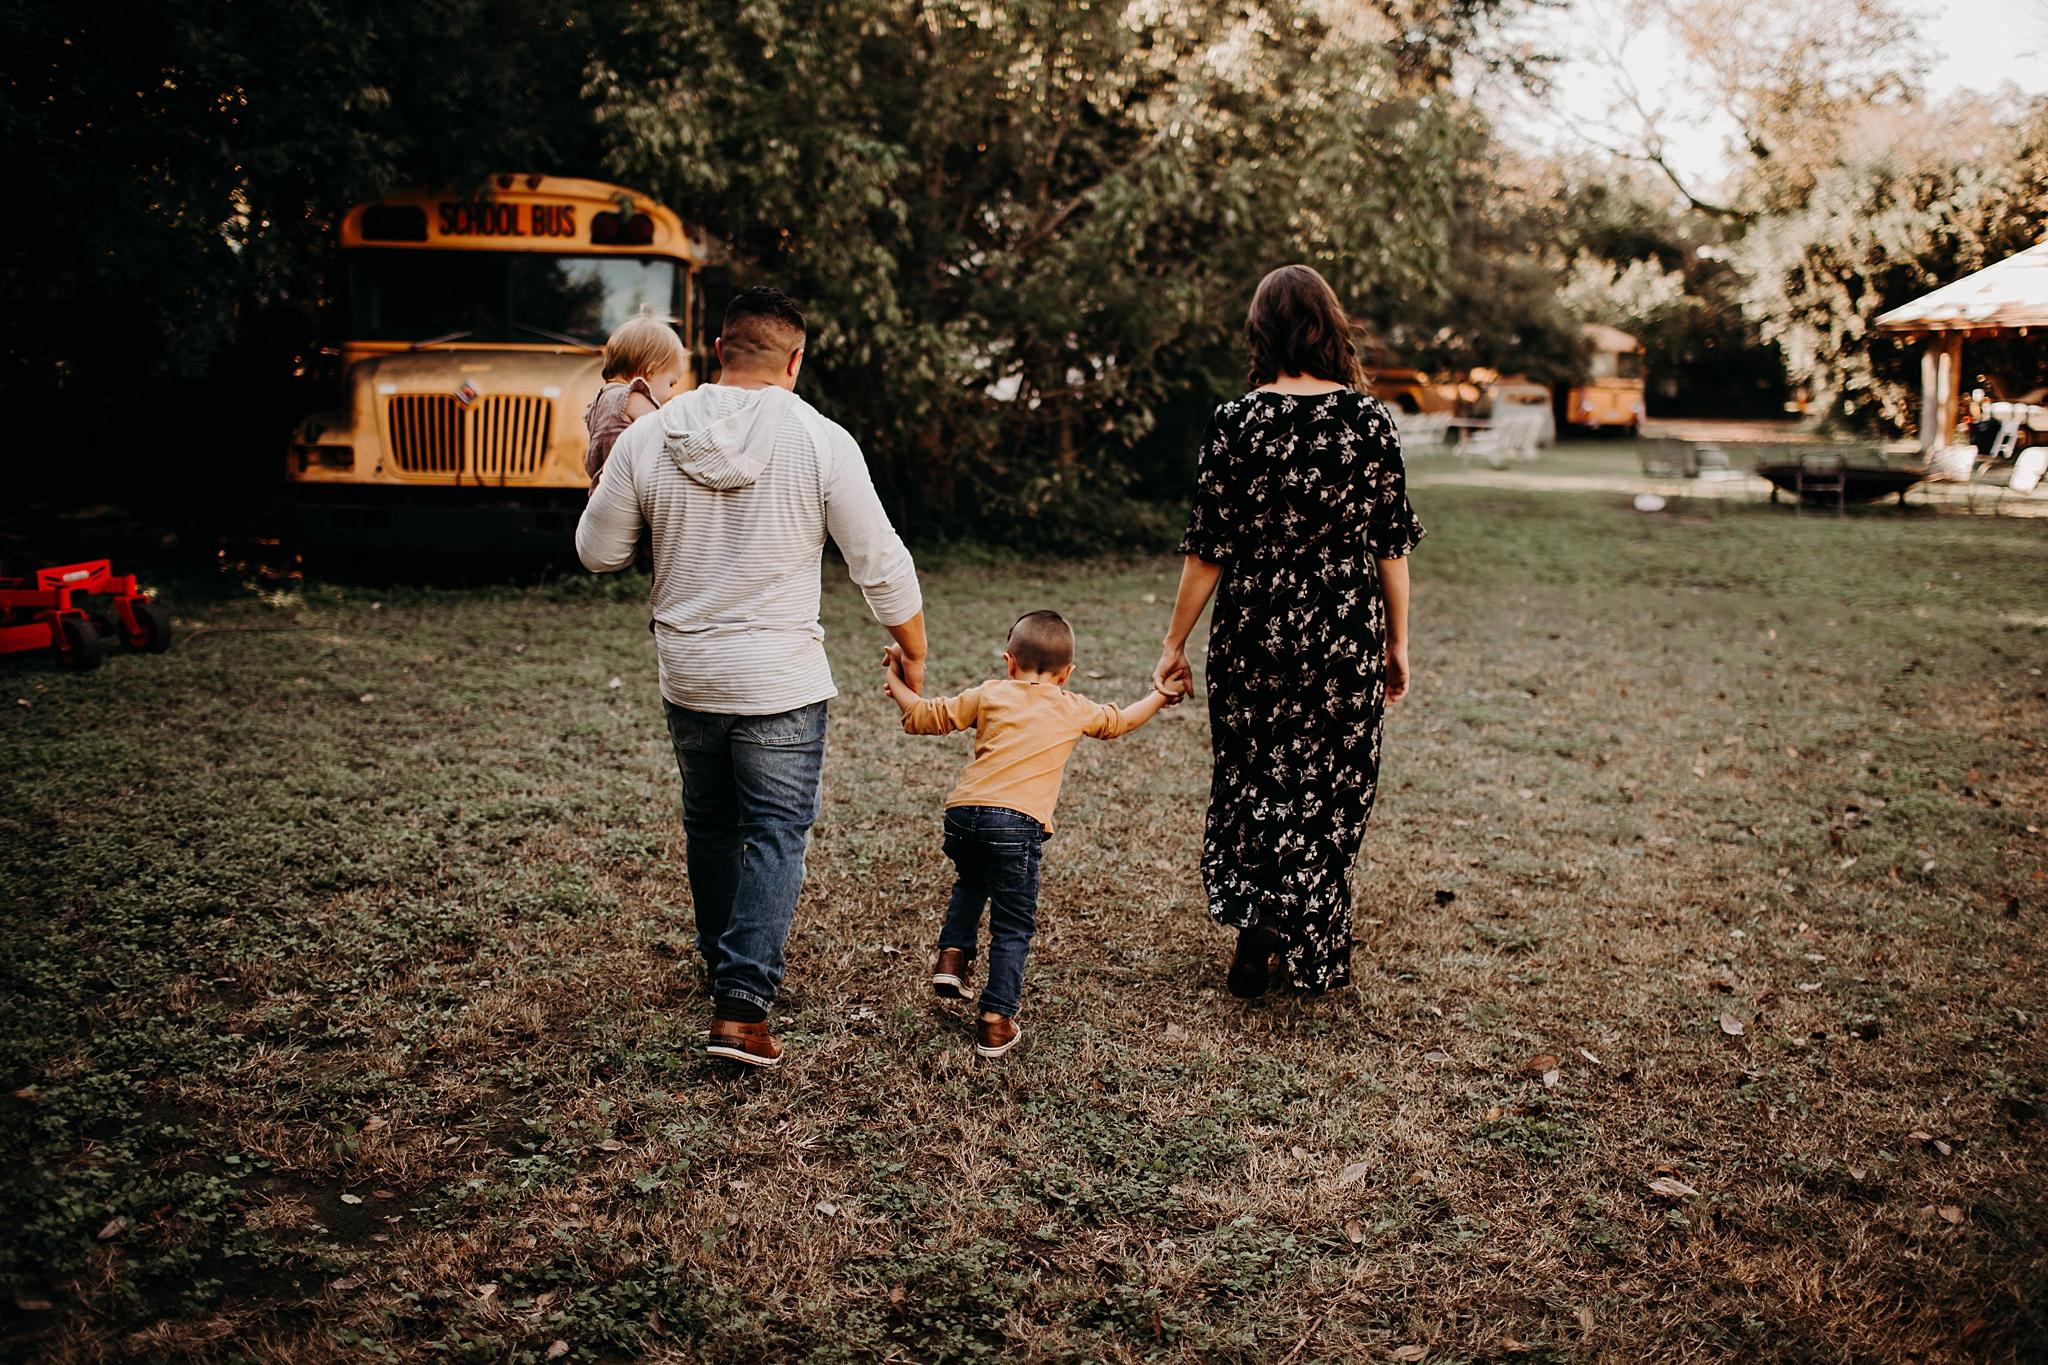 Luera-VMP-San-Antonio-Family-Photography-46_WEB.jpg